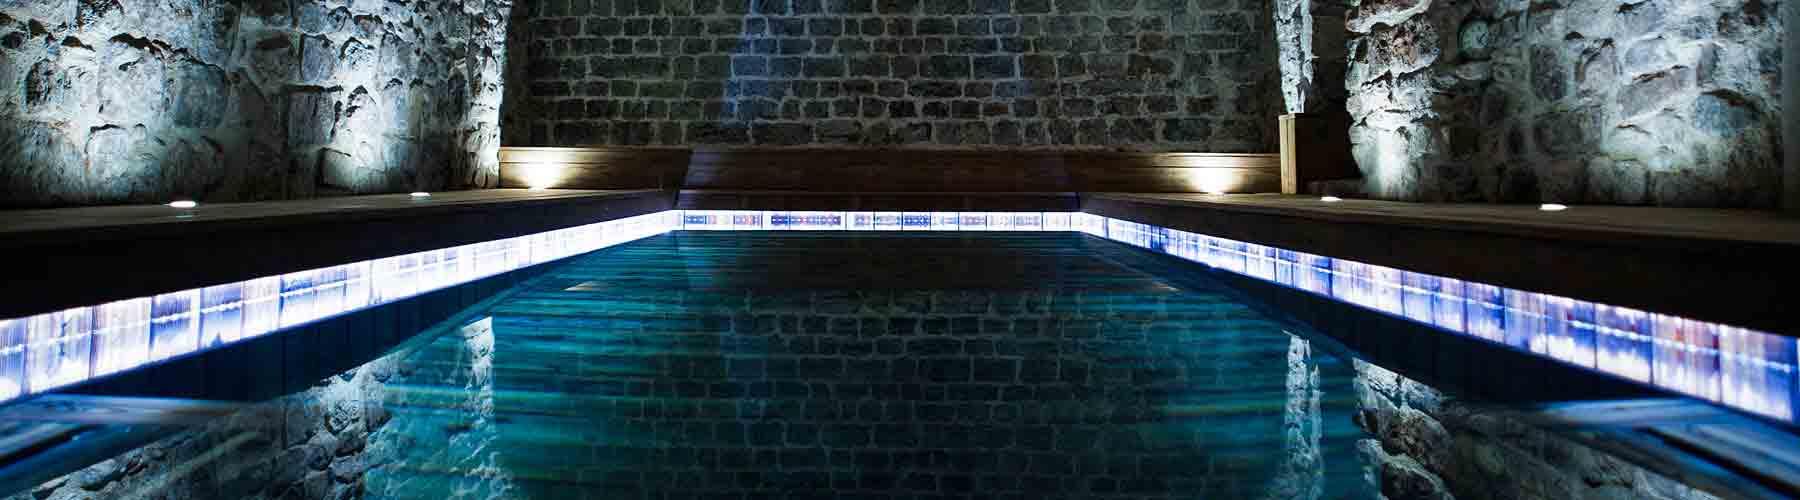 chambres d 39 hotes var charme piscine chauff e en provence. Black Bedroom Furniture Sets. Home Design Ideas